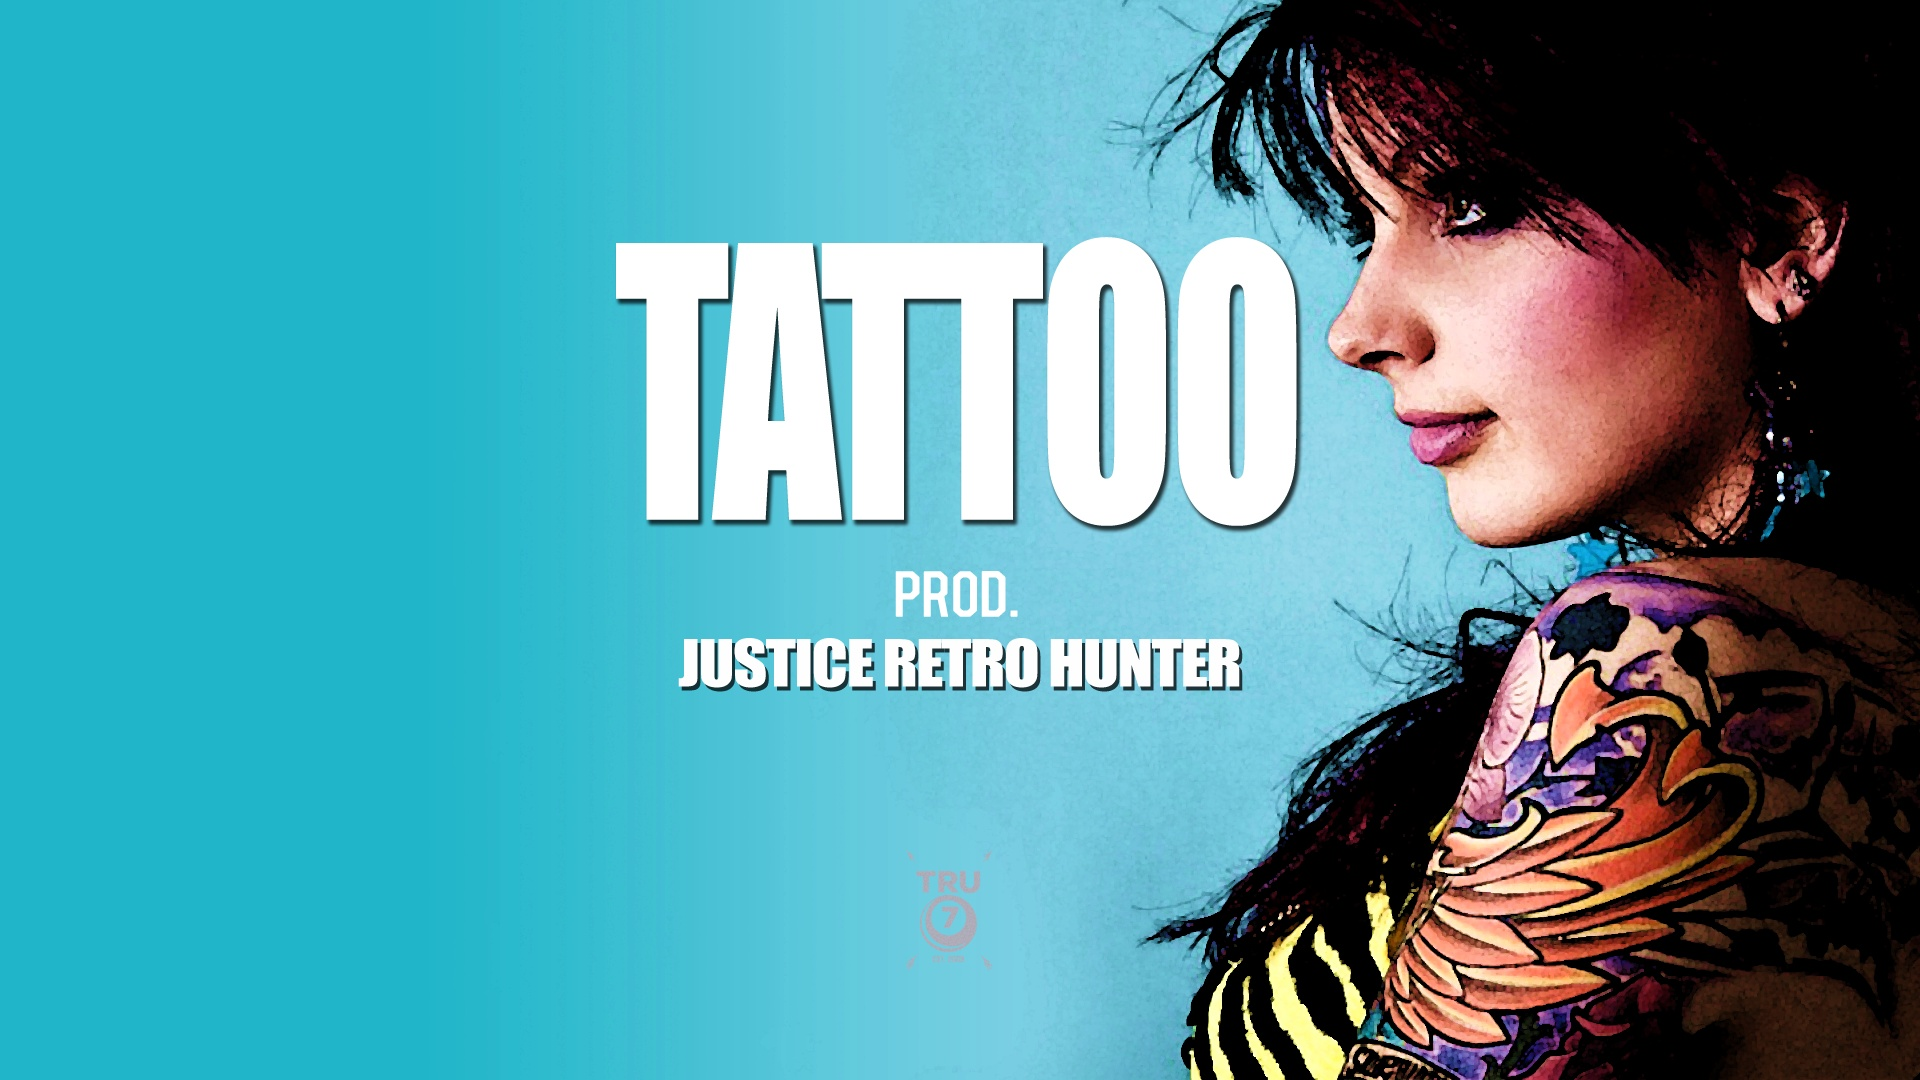 Tattoo - Premium Lease Package